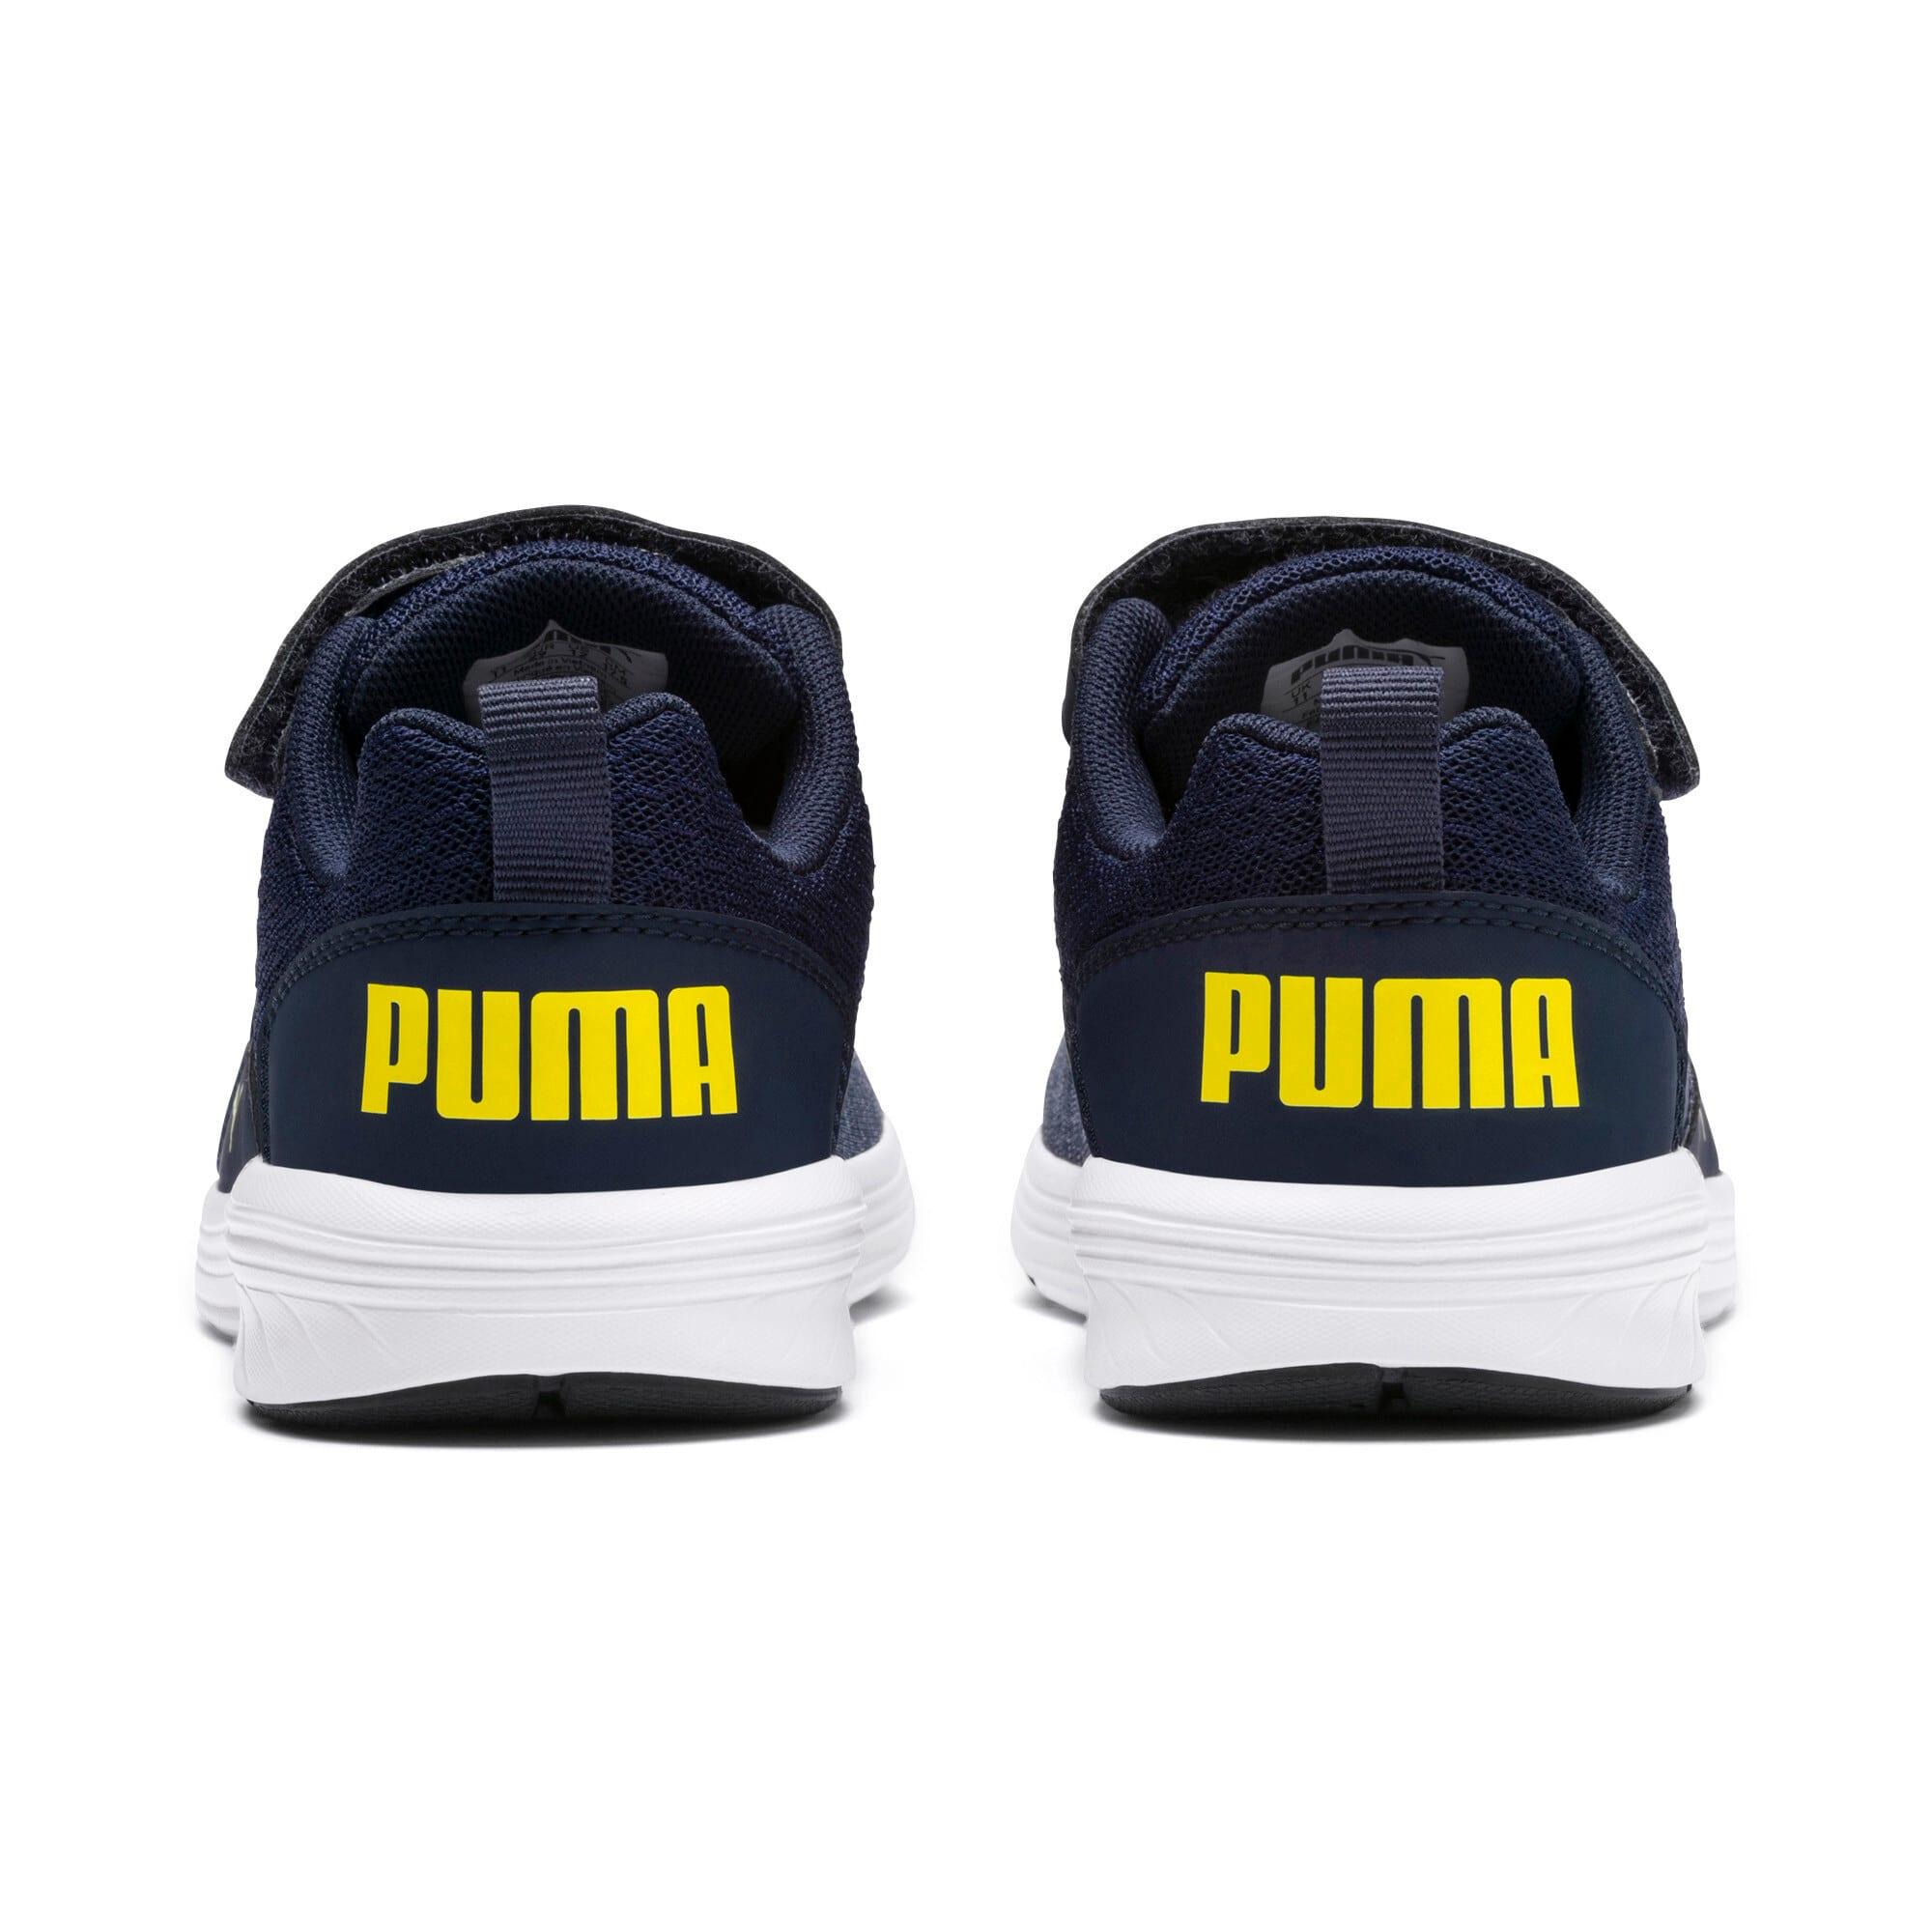 Thumbnail 2 of NRGY Comet Preschool Running Shoes, Peacoat-Blazing Yellow, medium-IND